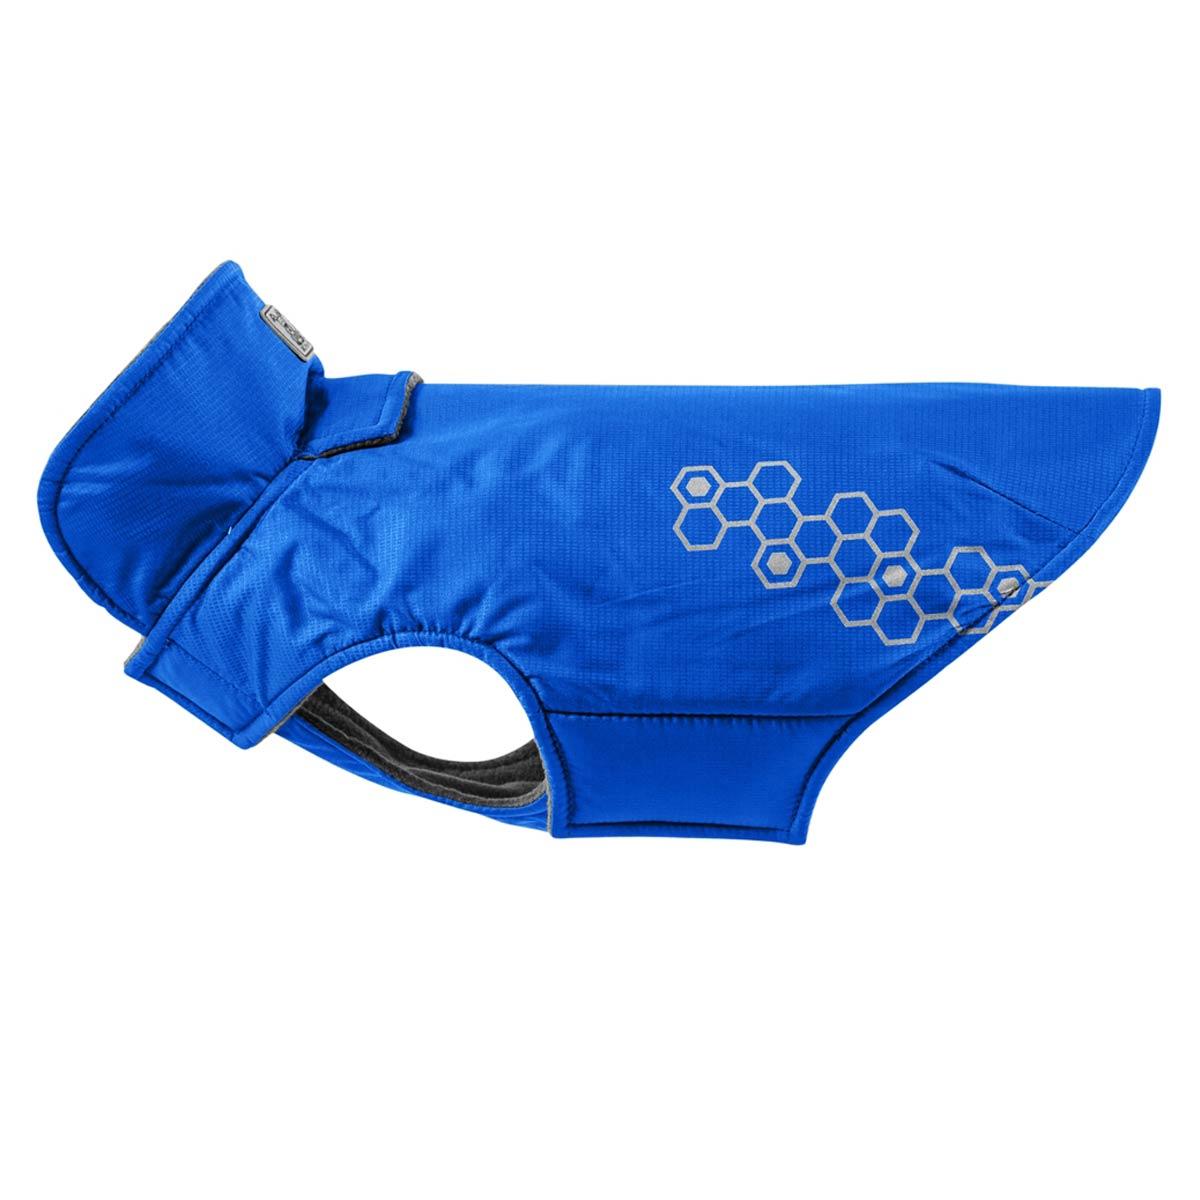 Venture Outerwear Dog Coat - Electric Blue